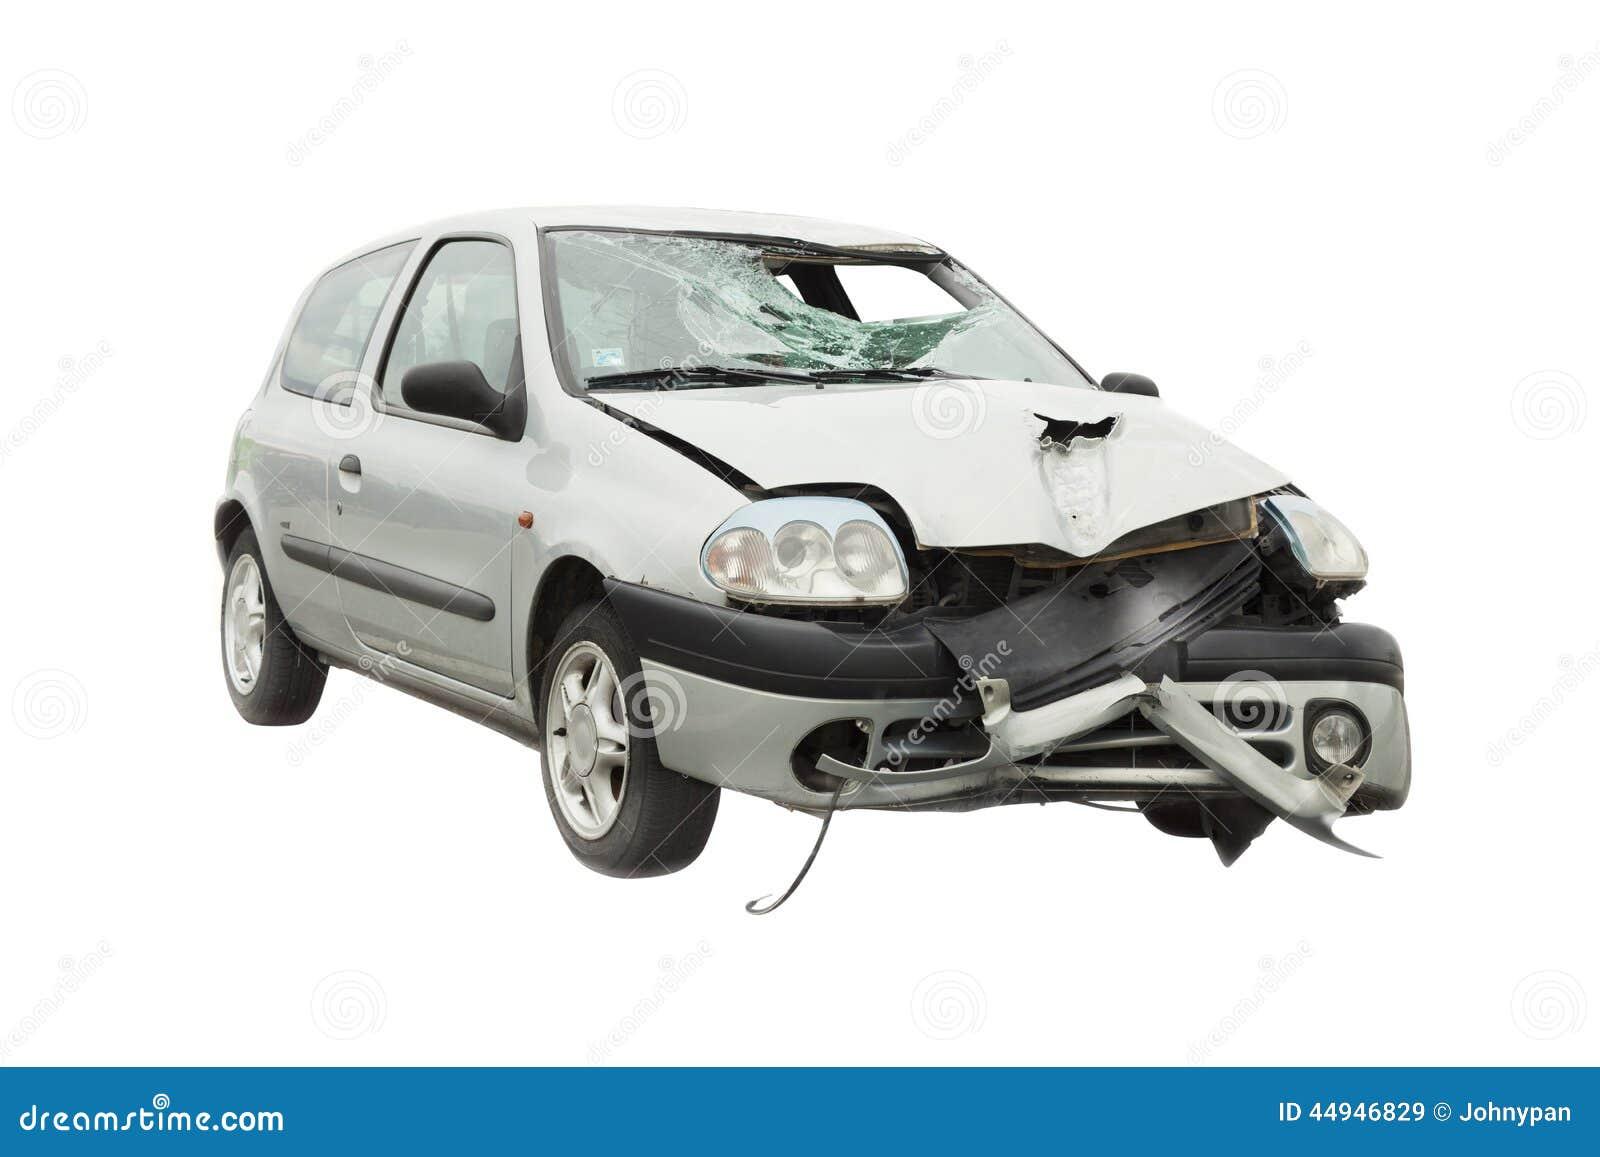 Car Accident Transparent Background